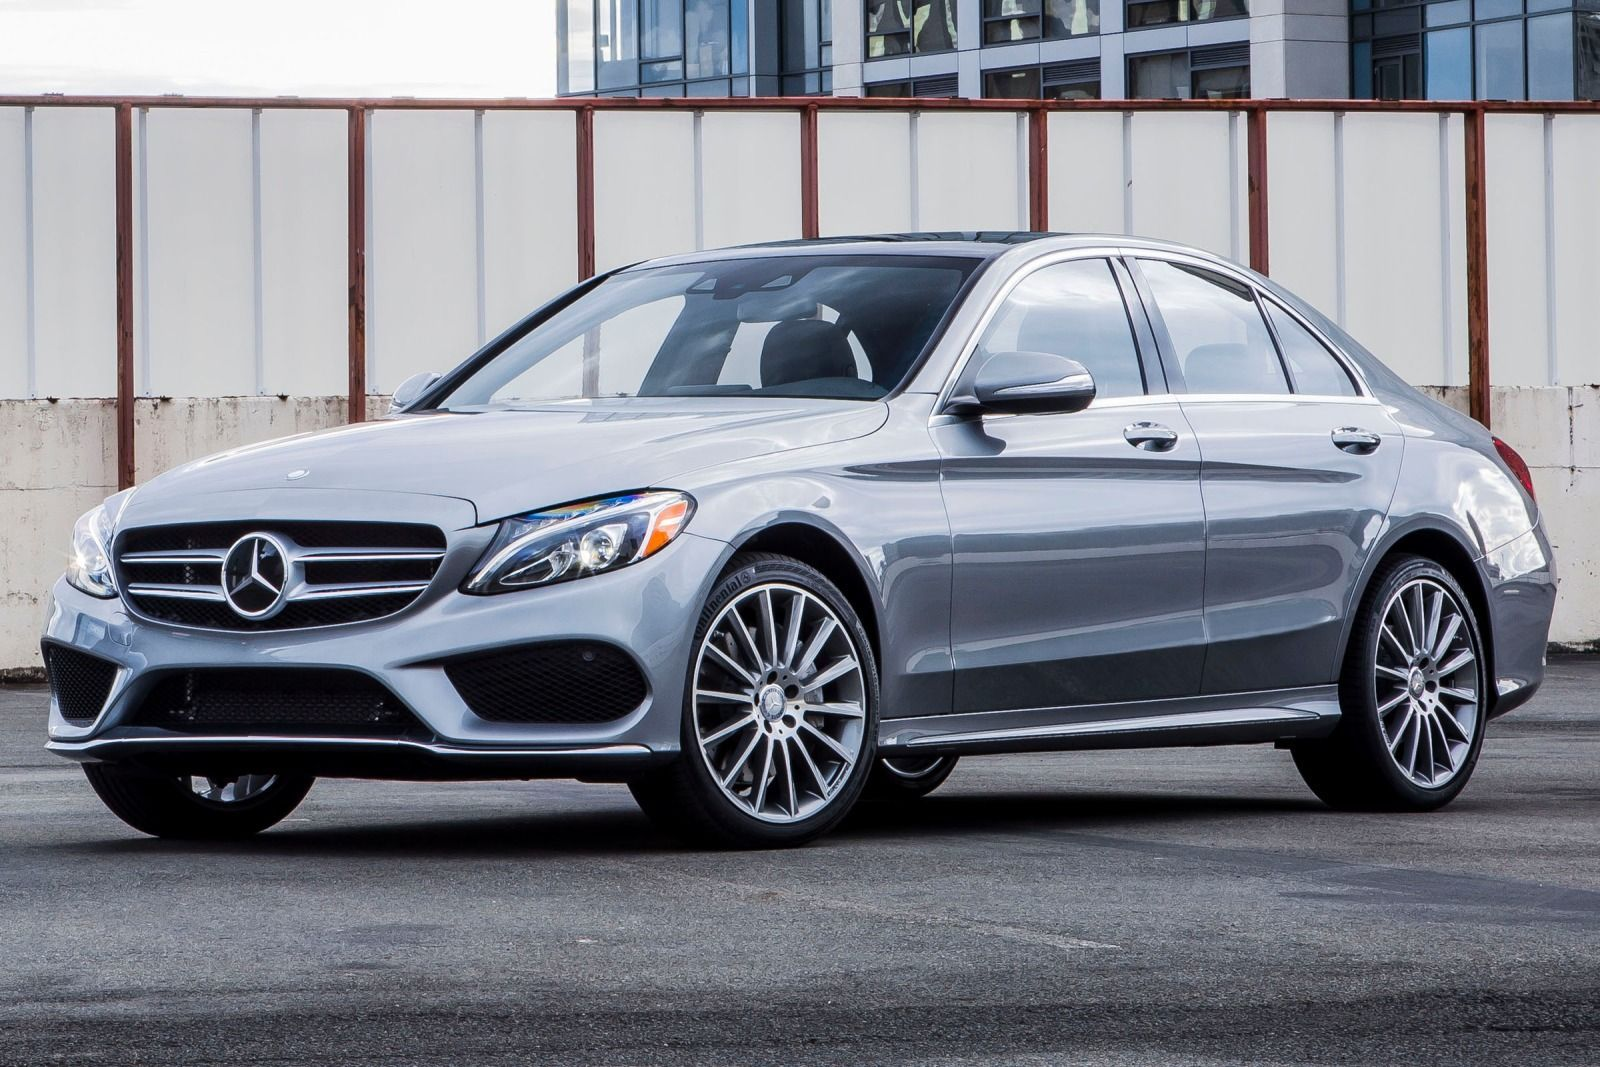 2015 Luxury Sedans 2015 Mercedes Benz C Class C300 Luxury 4matic 4dr Sedan Awd 2 0l 4cyl Mercedes Benz C300 Benz Mercedes Benz Cars